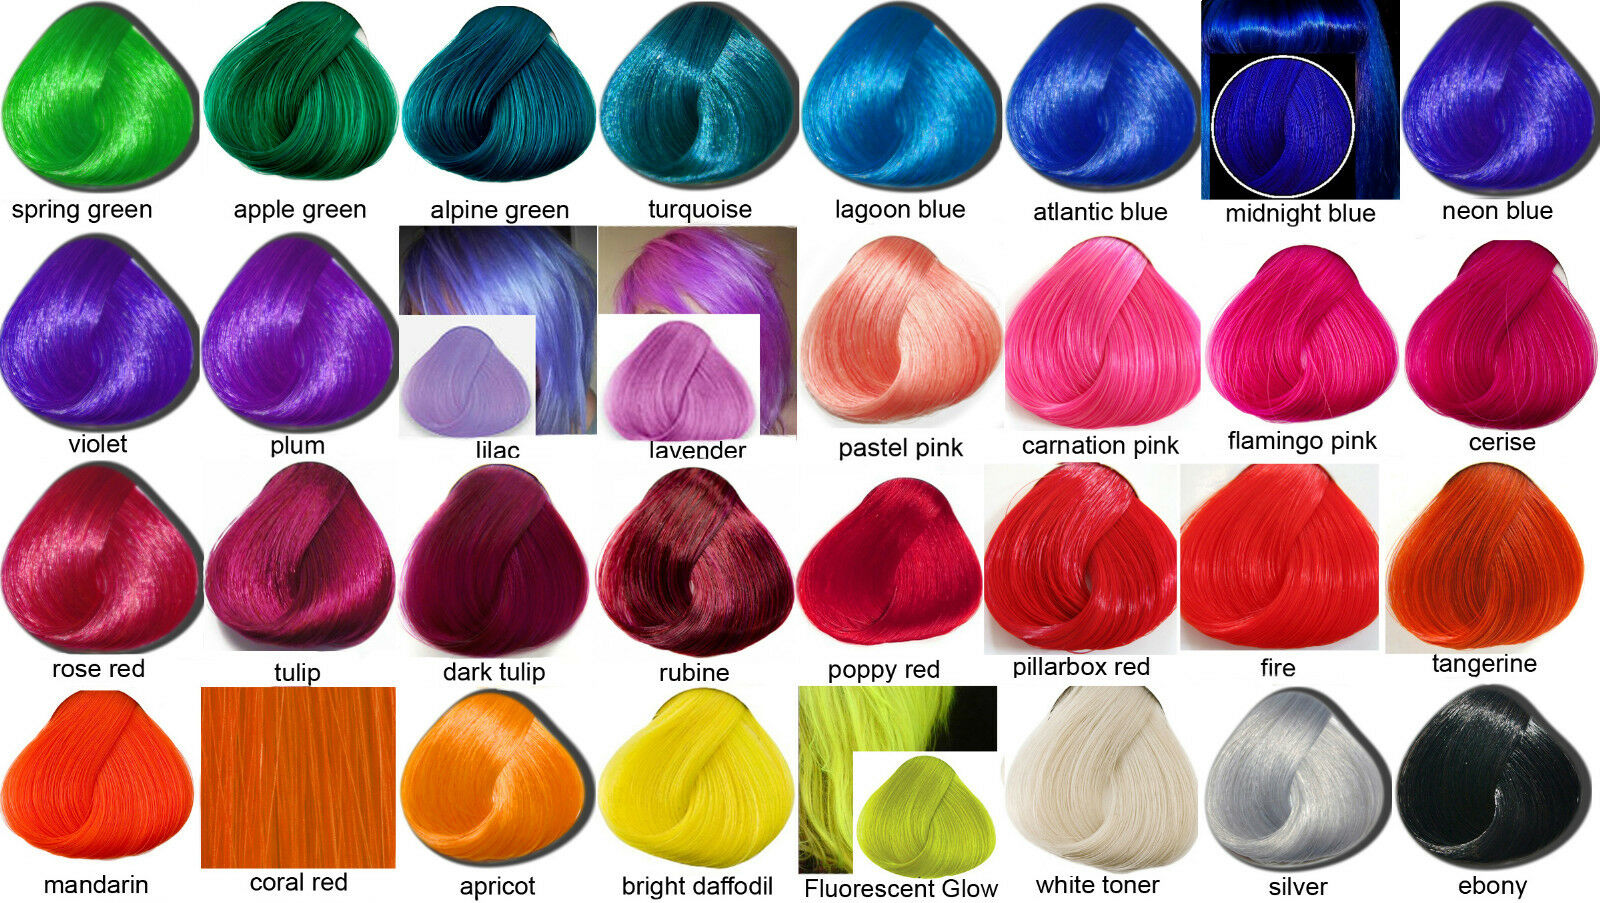 Directions Haarfarbe Blau Test Vergleich Directions Haarfarbe